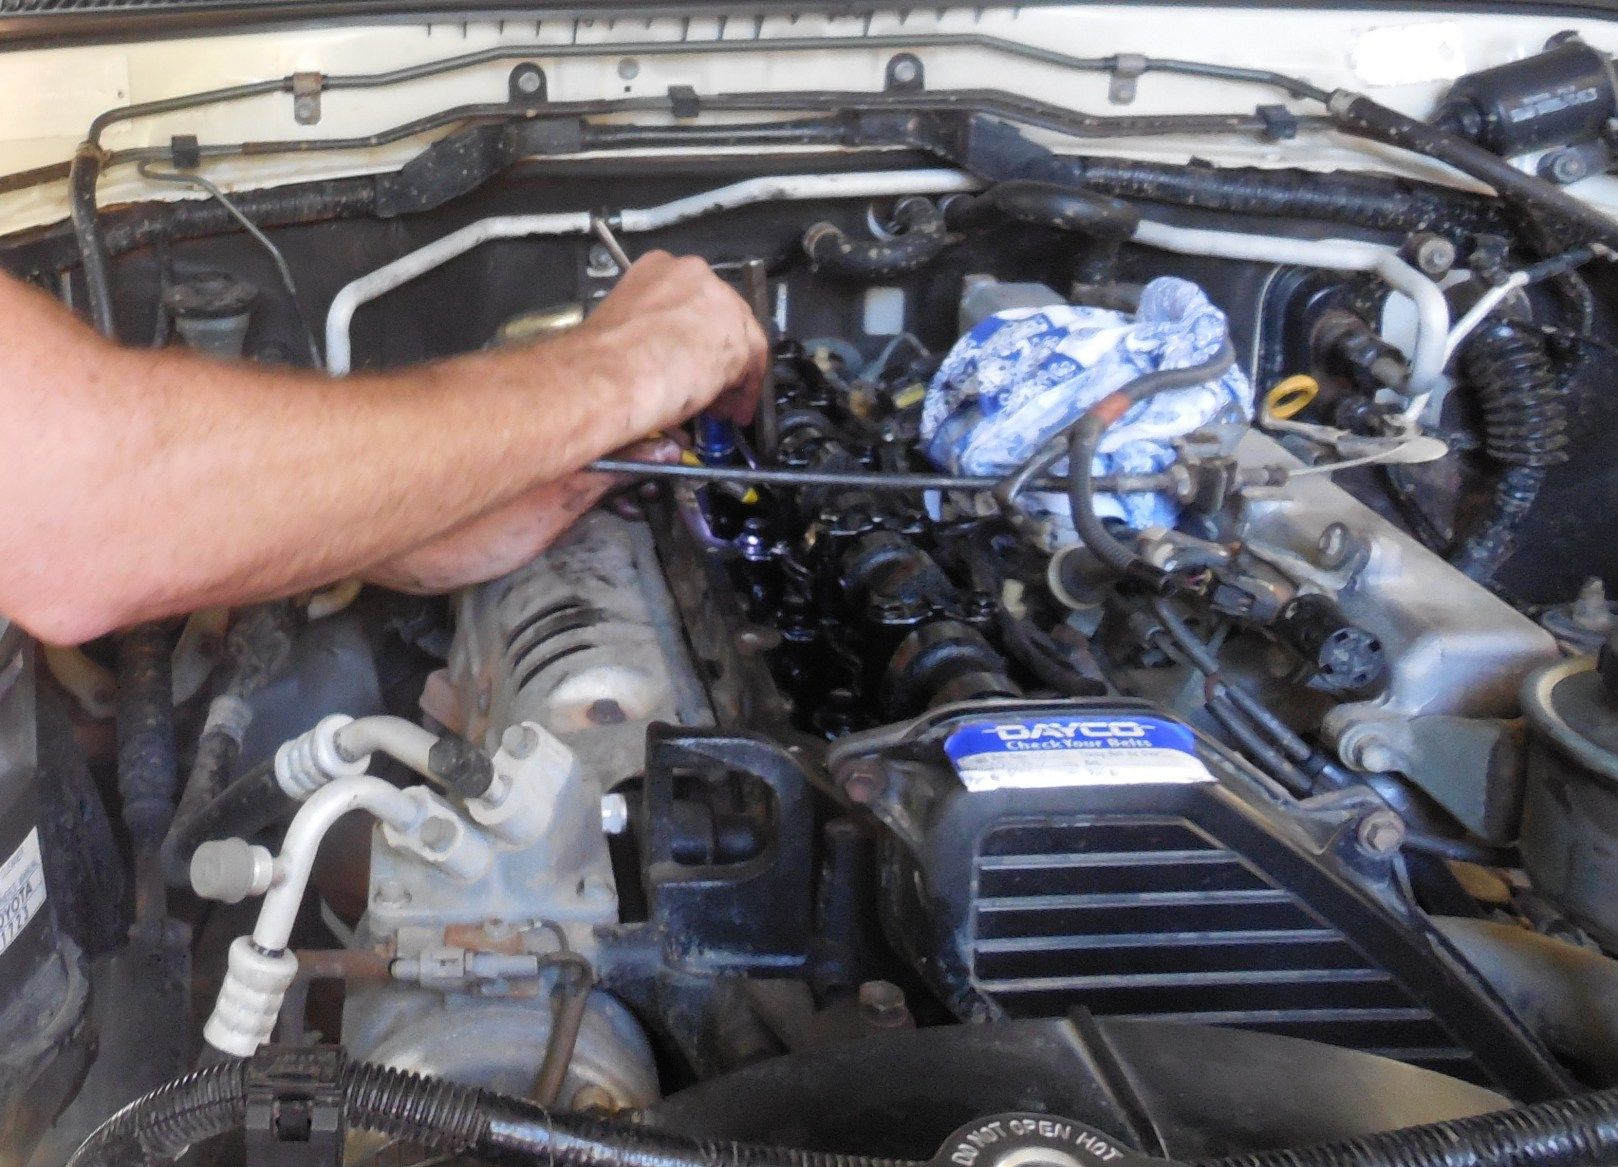 Using T&E tool No 88250 for removing Toyota 1HZ/1HDT valve shims